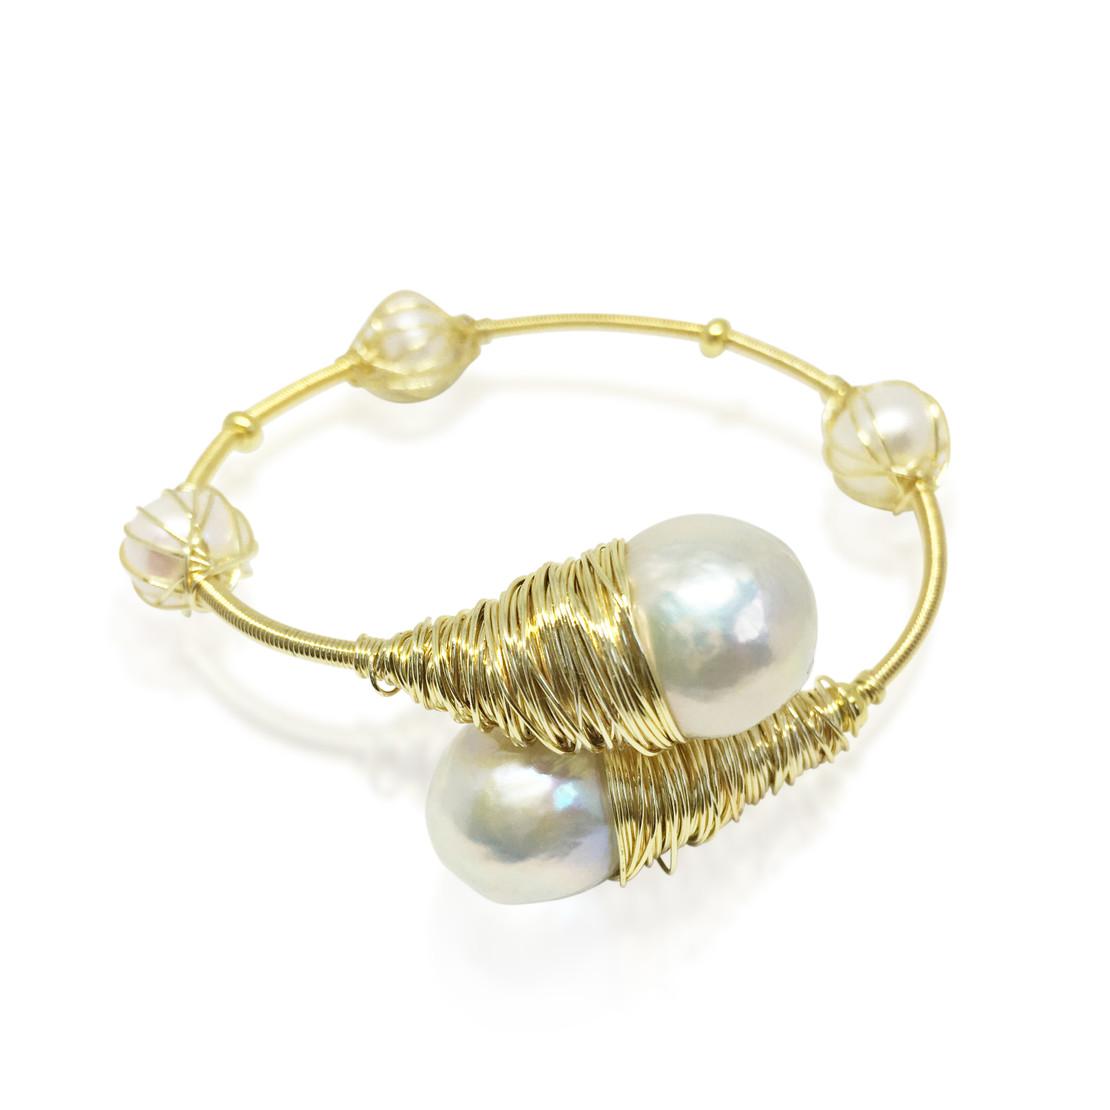 Your Demi-Fine Pearl Jewellery